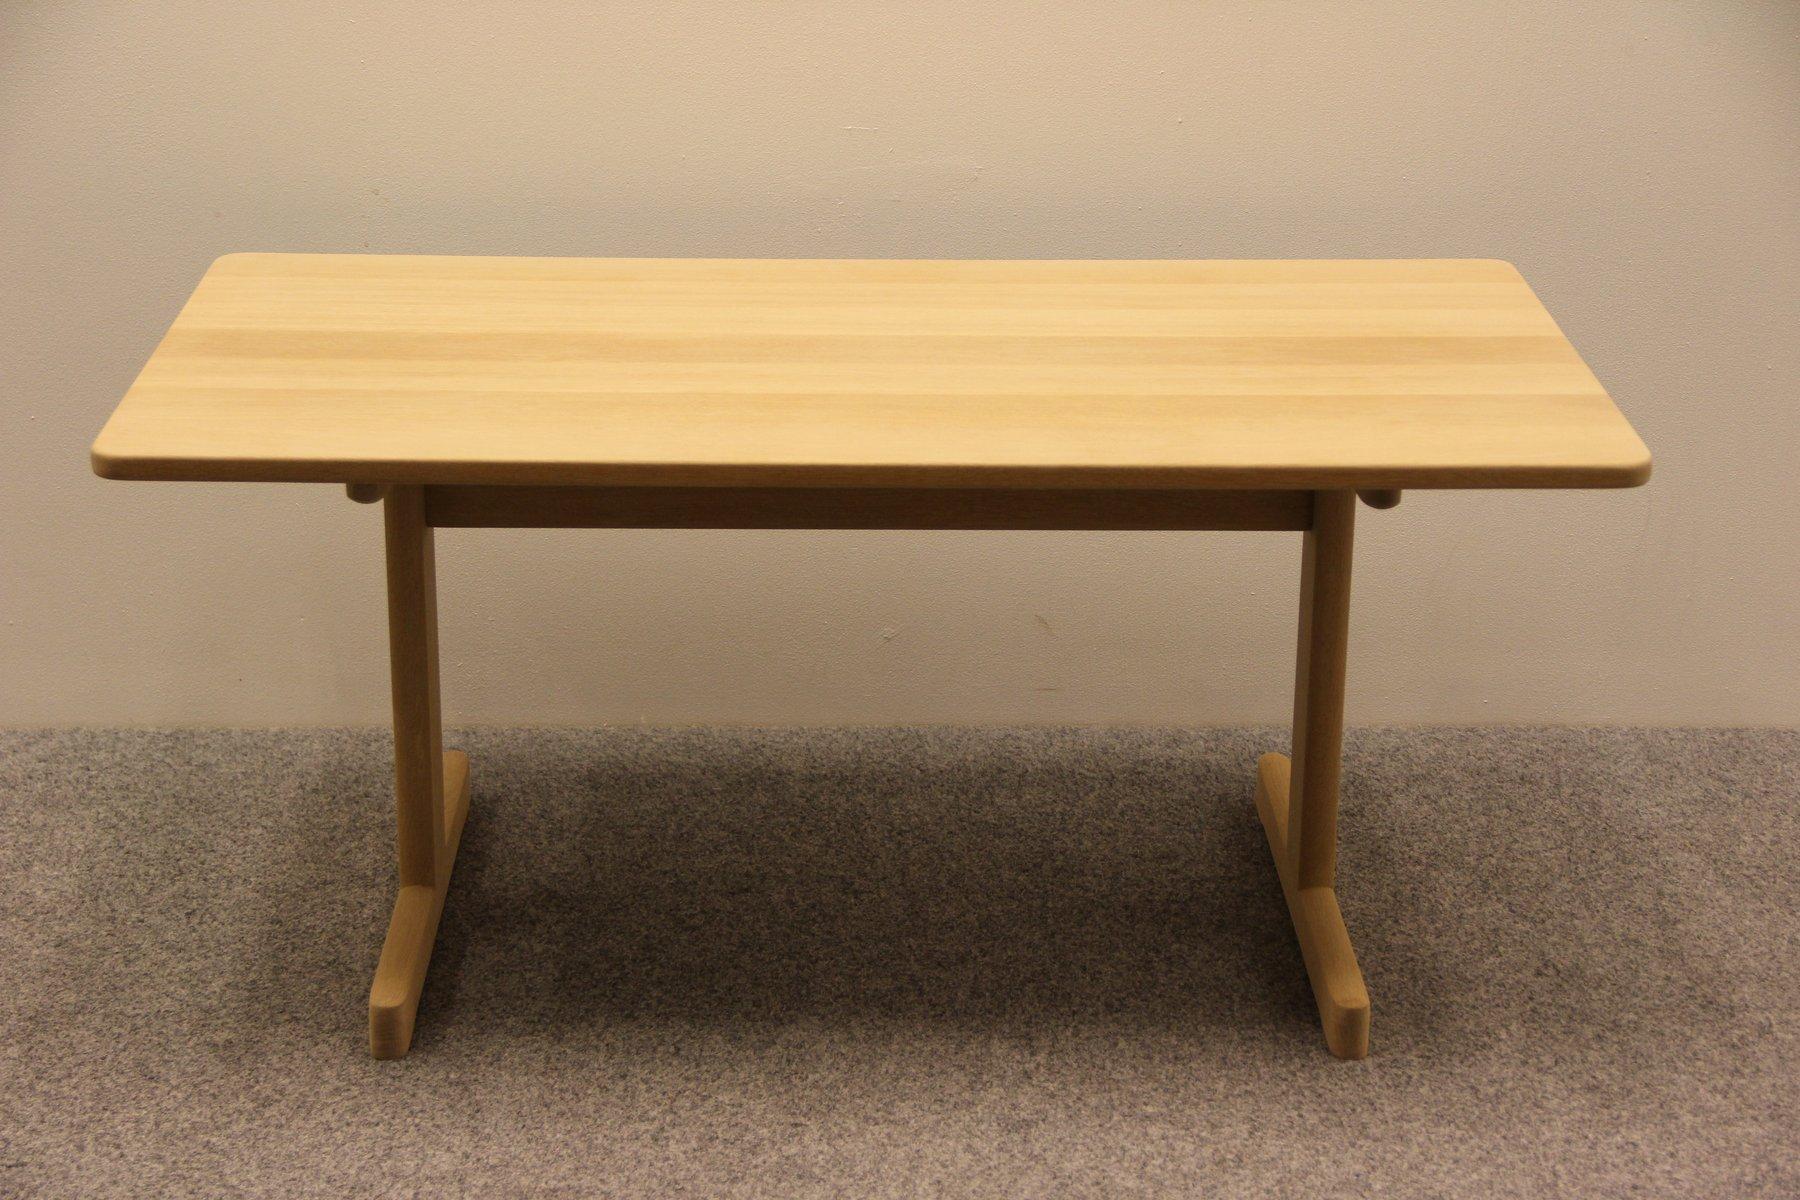 table basse en h tre model 5270 par b rge mogensen pour. Black Bedroom Furniture Sets. Home Design Ideas